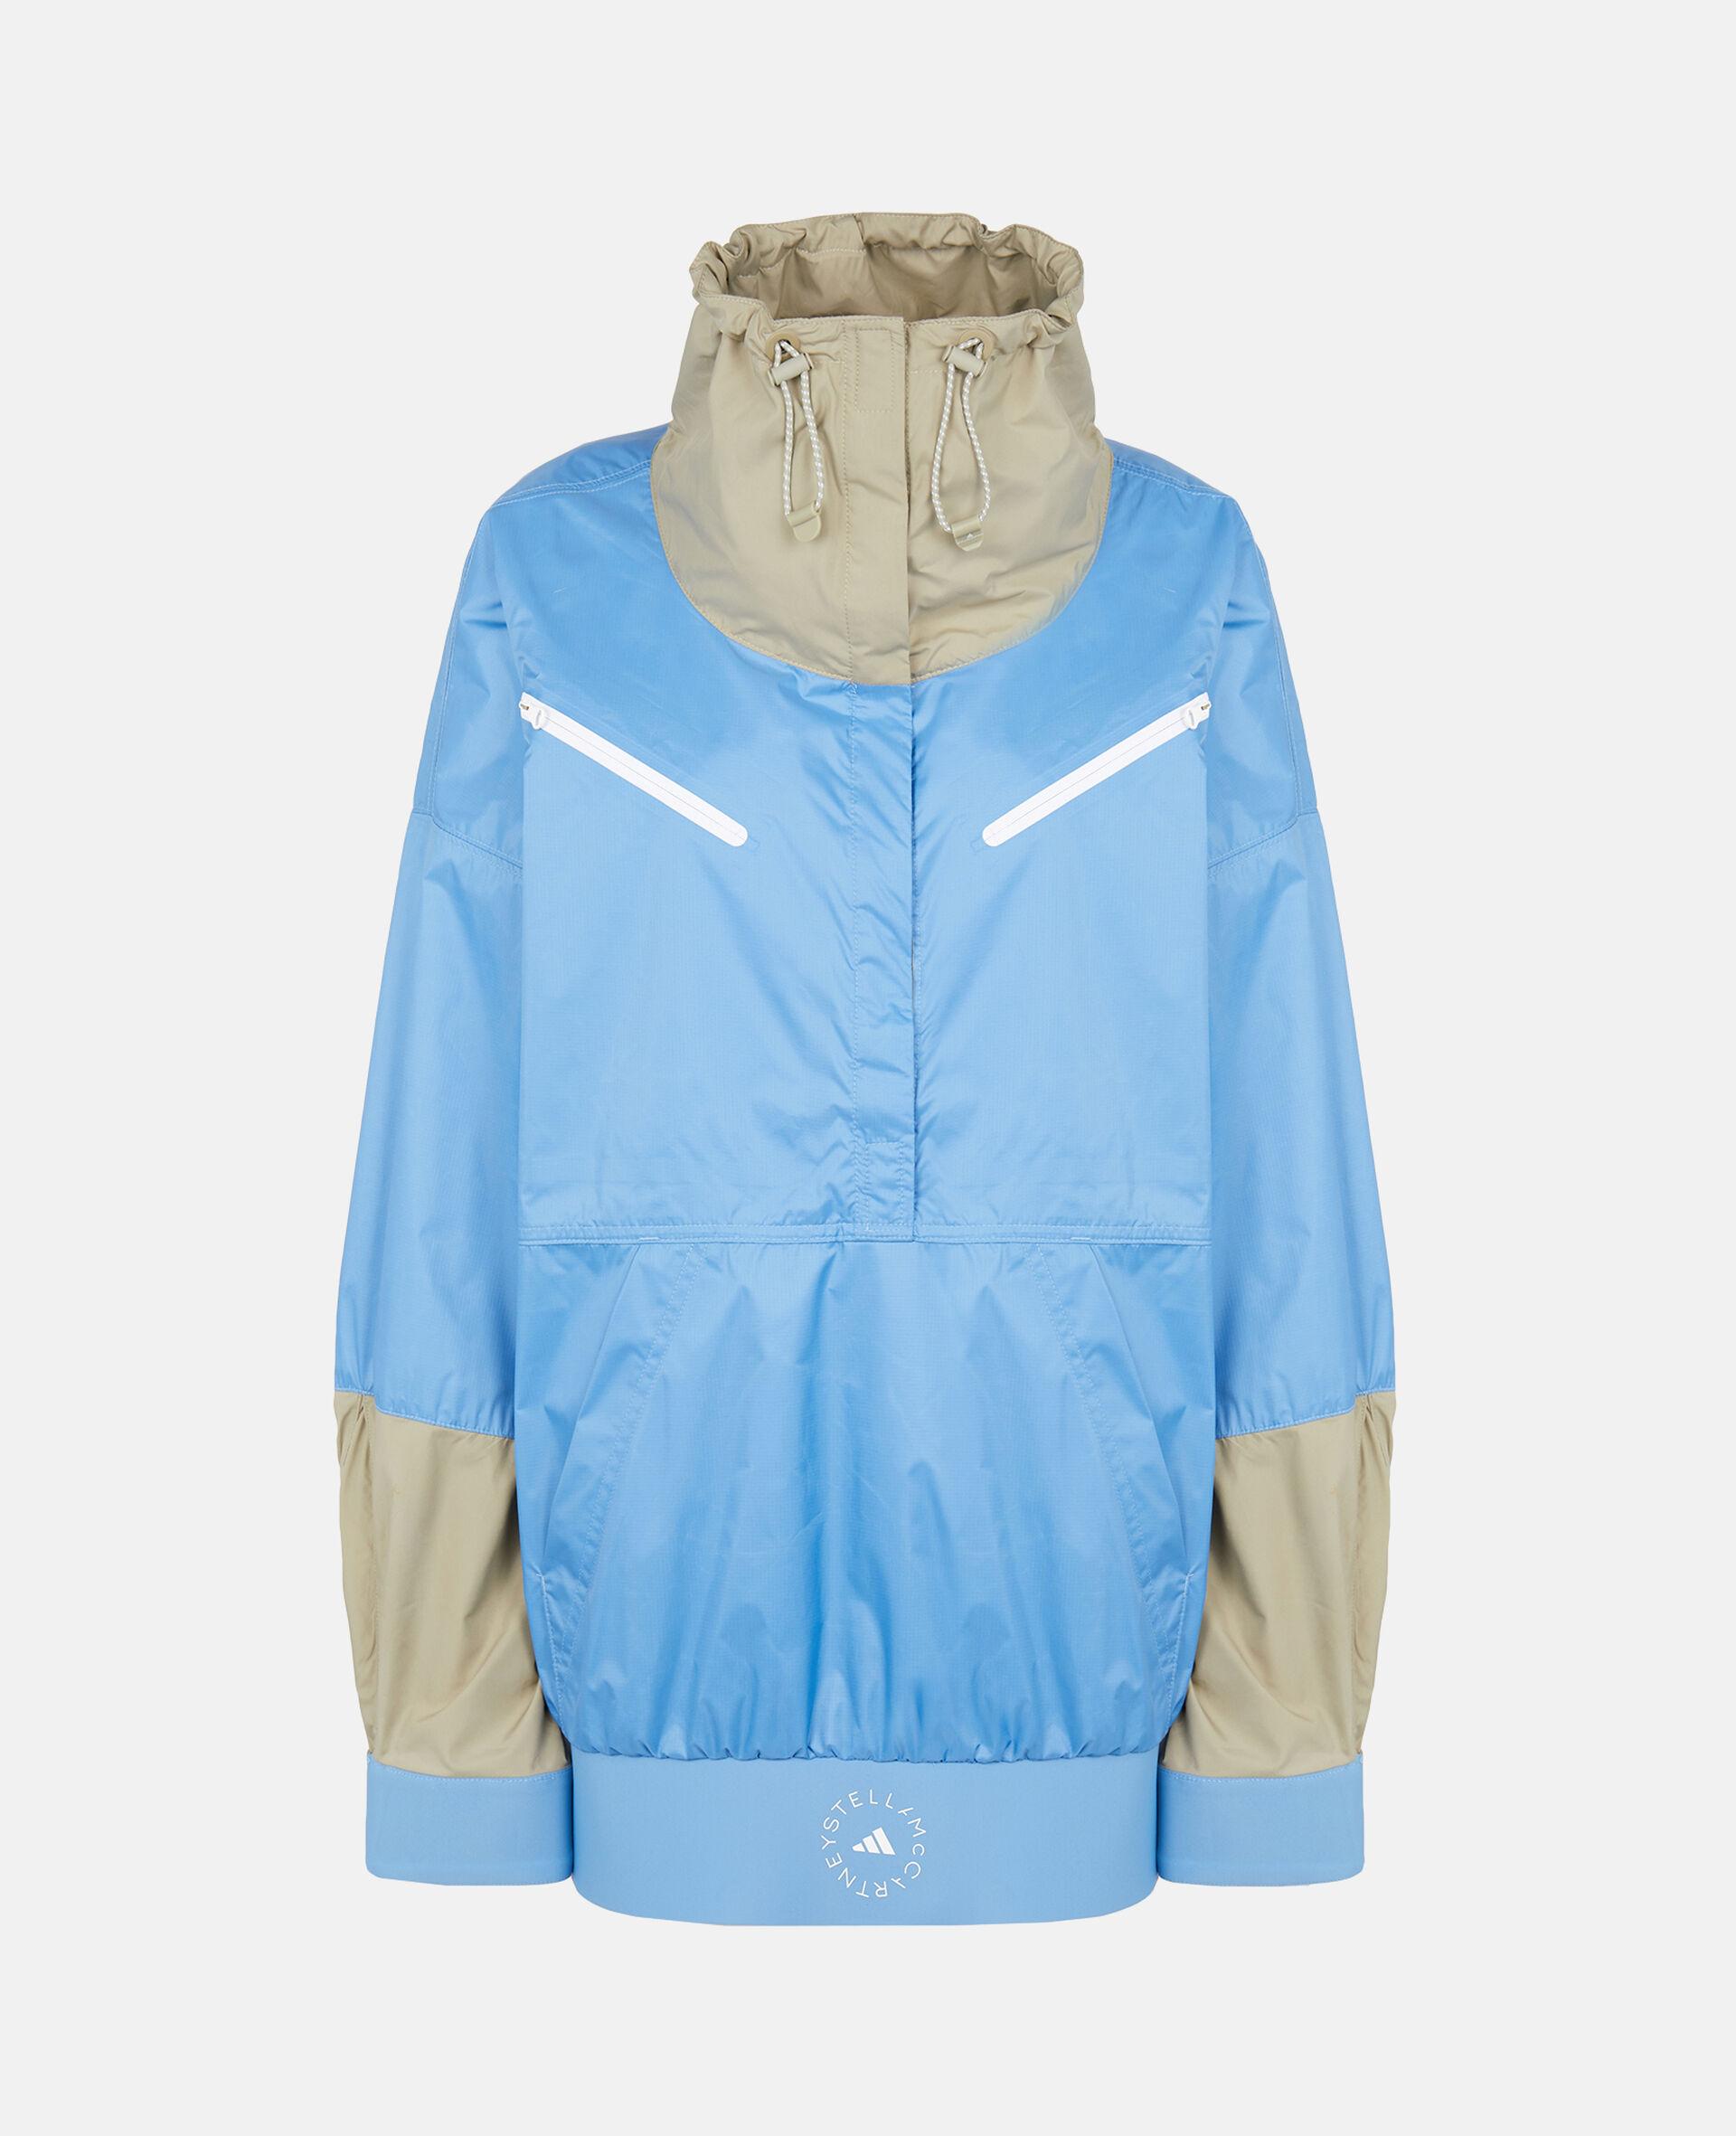 Beach Defender Jacke mit halbem Reißverschluss-Blau-large image number 0